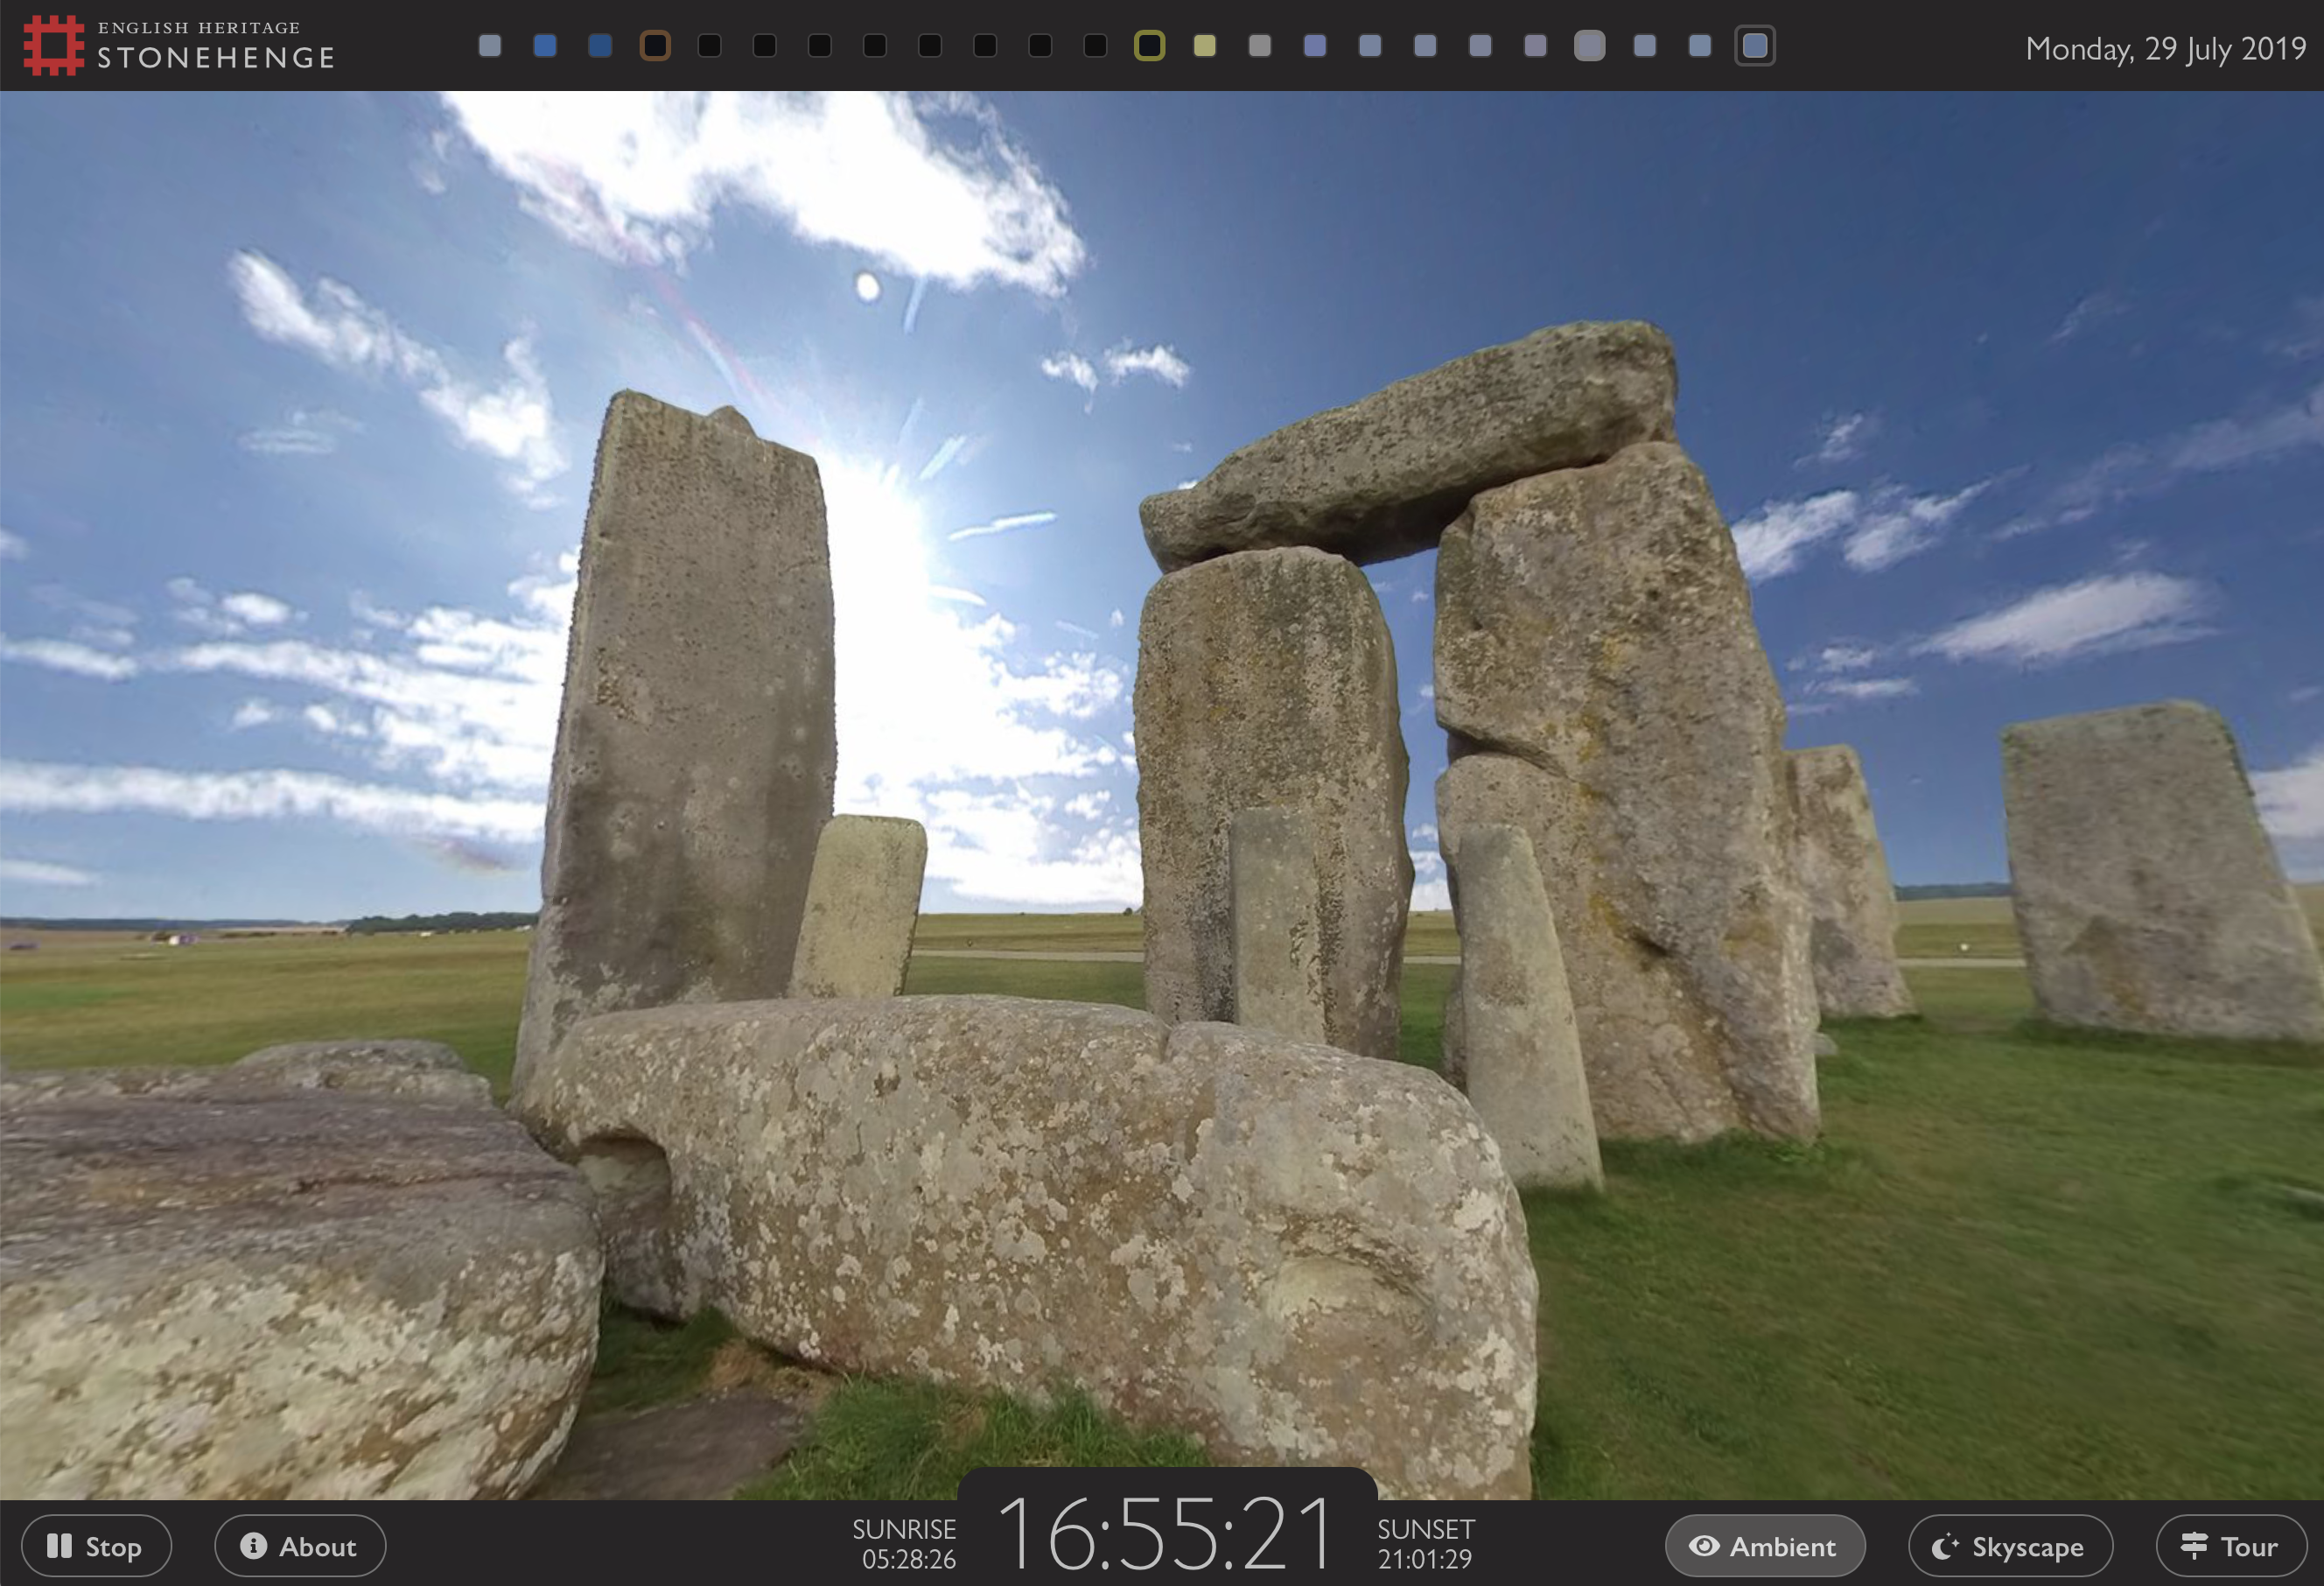 View Stonehenge in real time via Raspberry Pi - Raspberry Pi